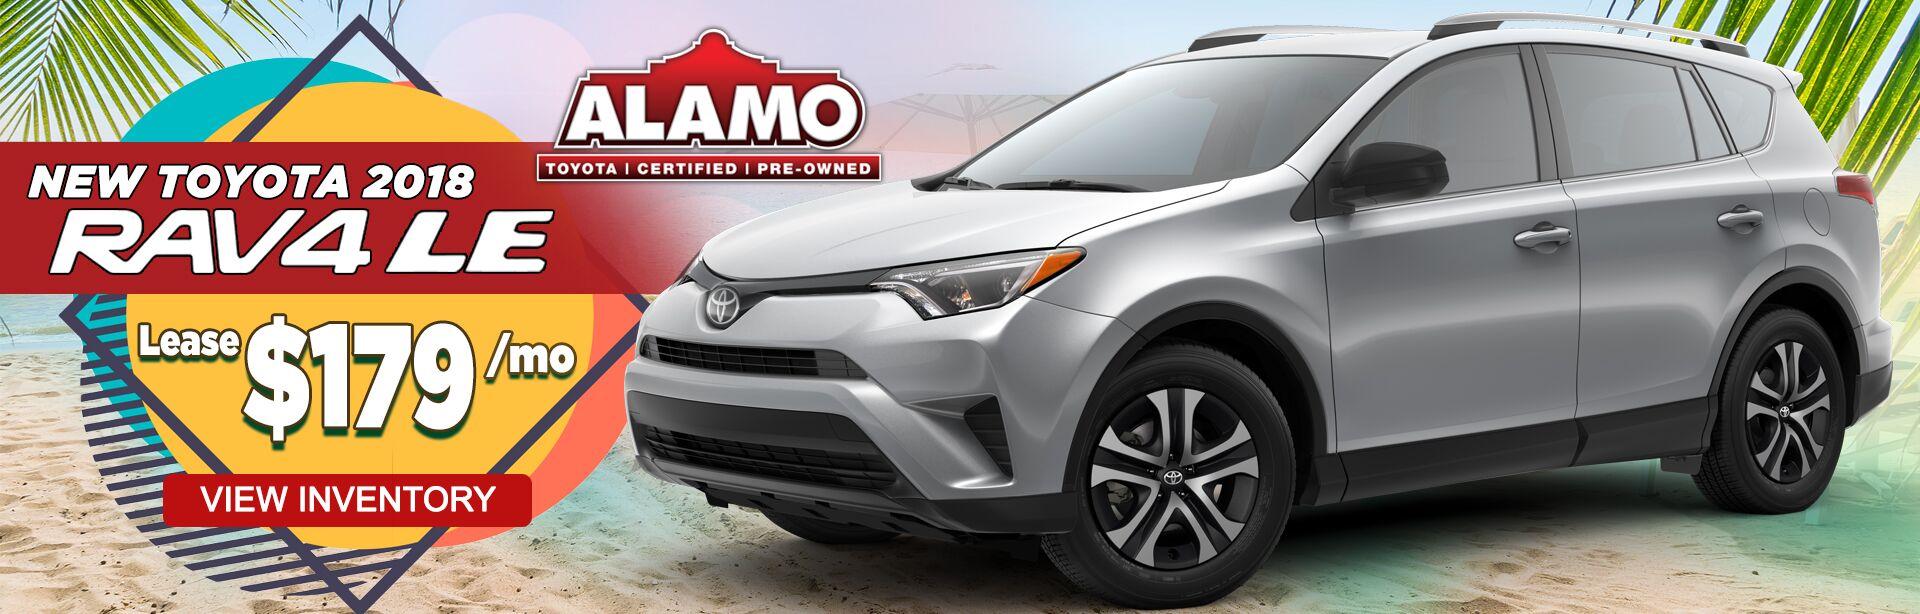 Toyota Dealership San Antonio Tx >> Cadillac Dealership San Antonio Upcoming New Car Release 2020